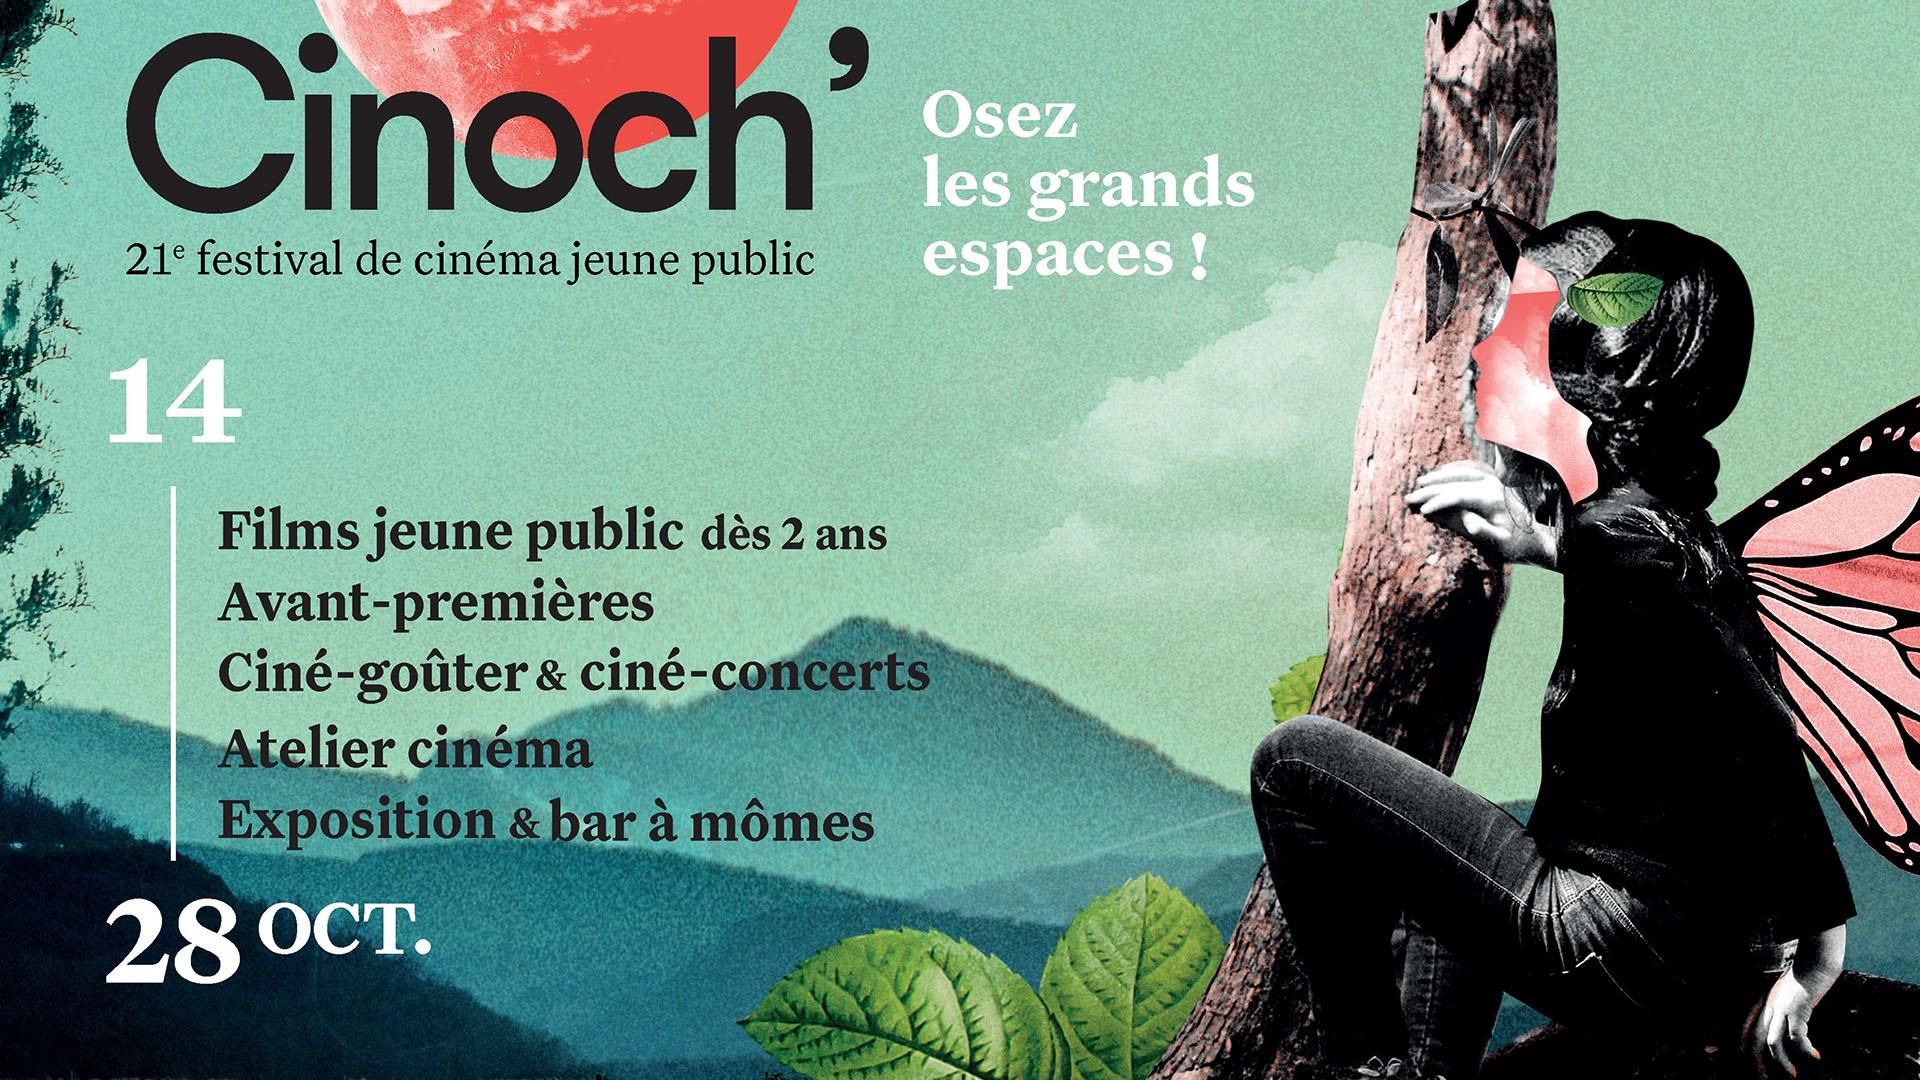 Cinoch 21e Festival à Rixheim : 21e festival de cinéma jeune public